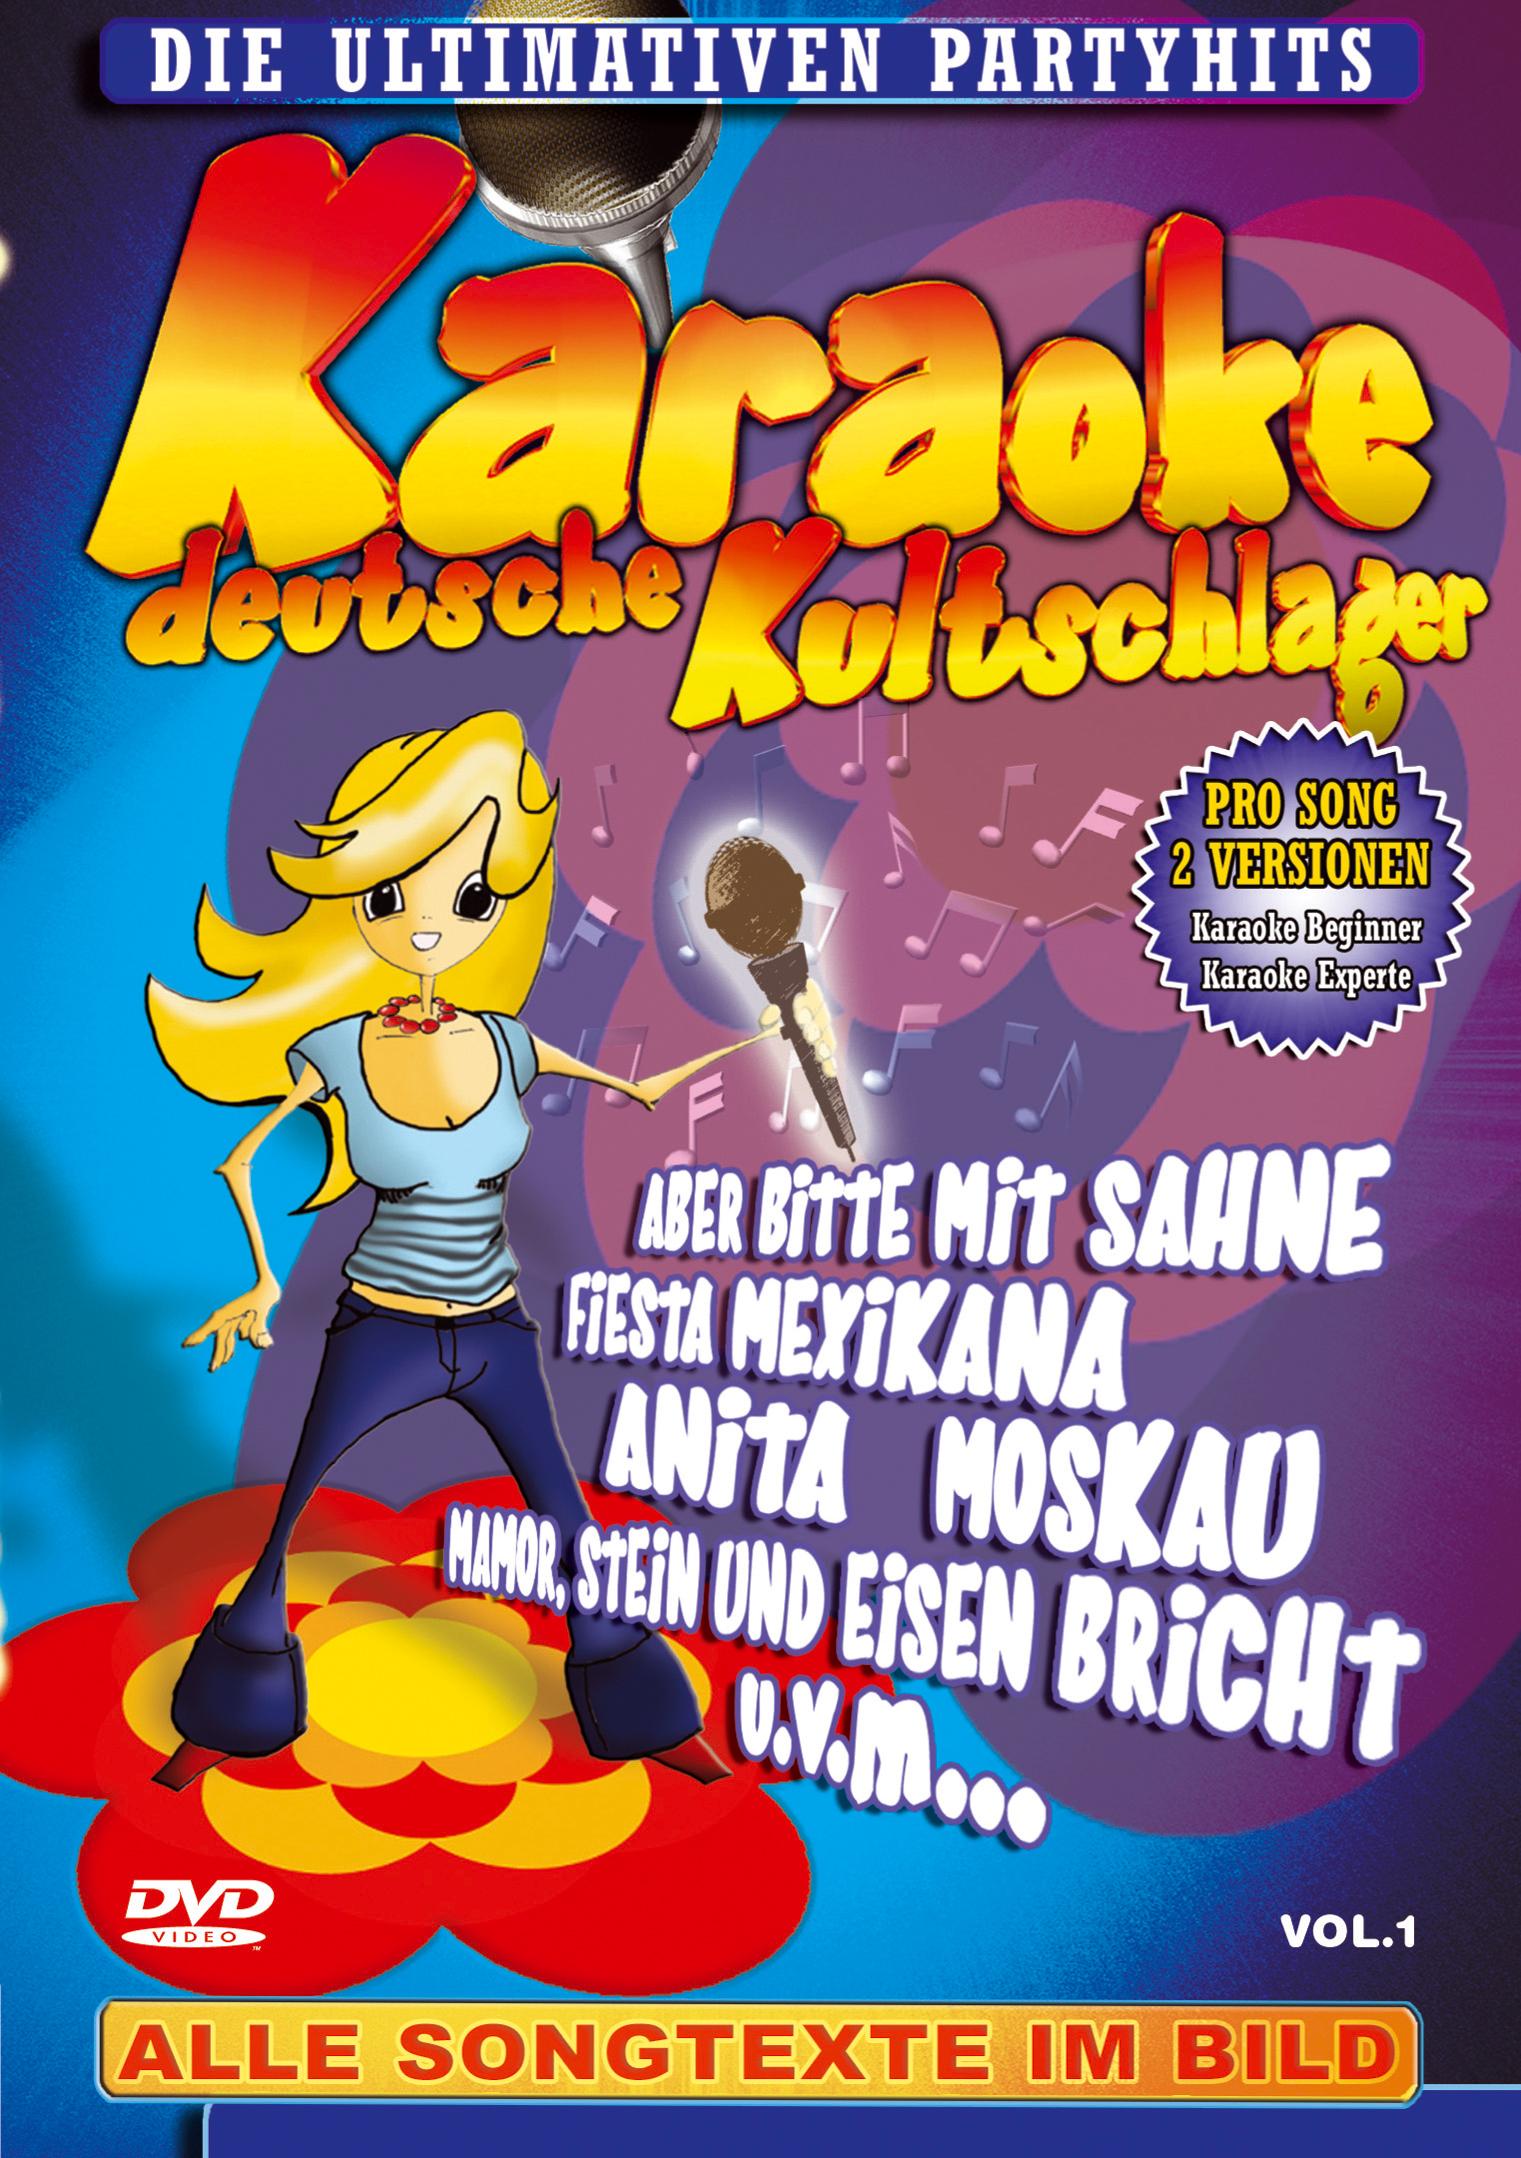 Karaoke: Deutsche Kultschlager - Vol. 1